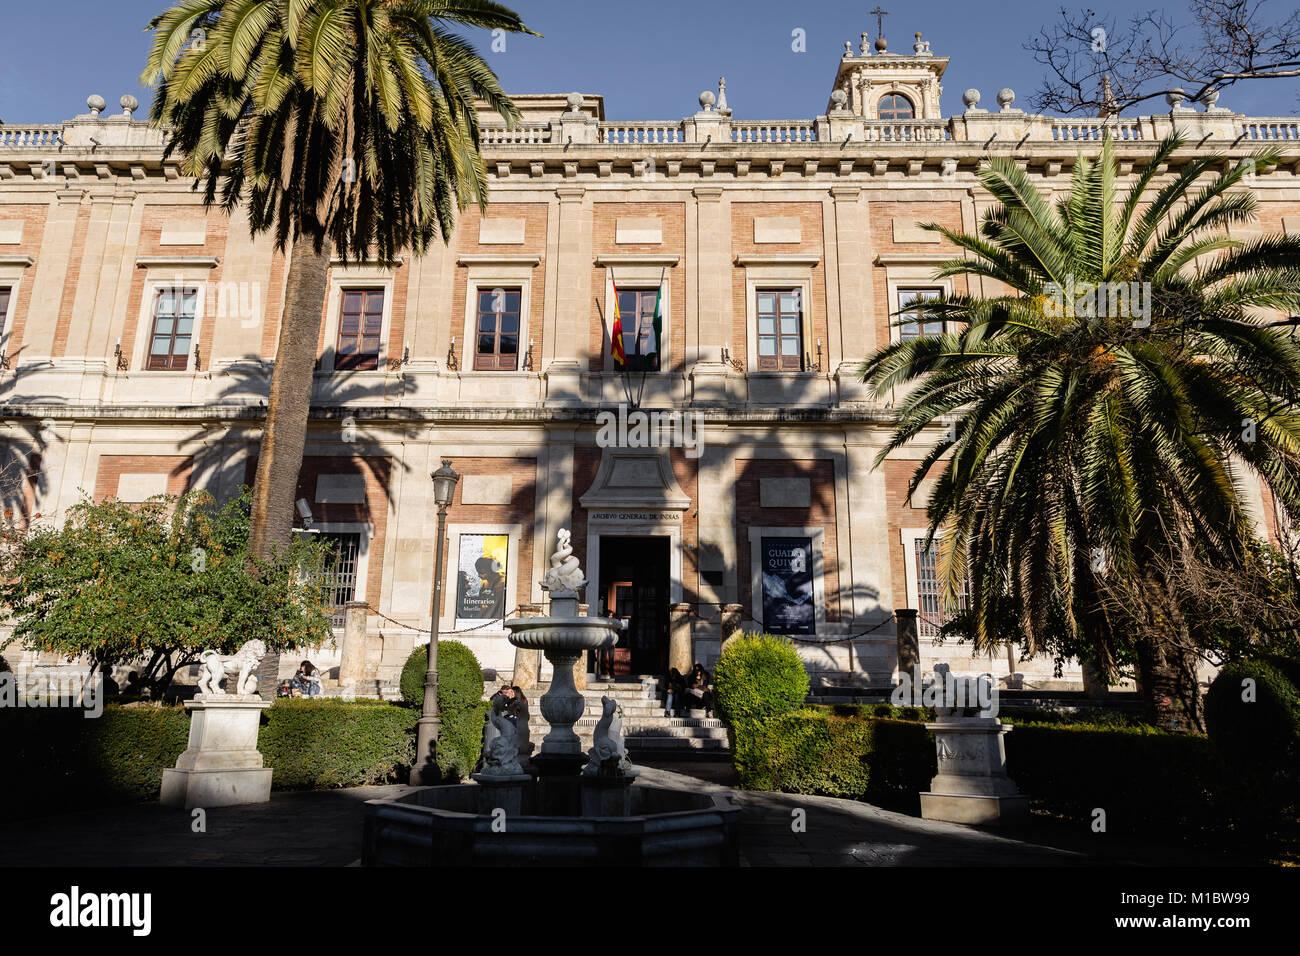 Archivo General de Indias, Deneral Archives of the Indies, Seville, Spain. - Stock Image